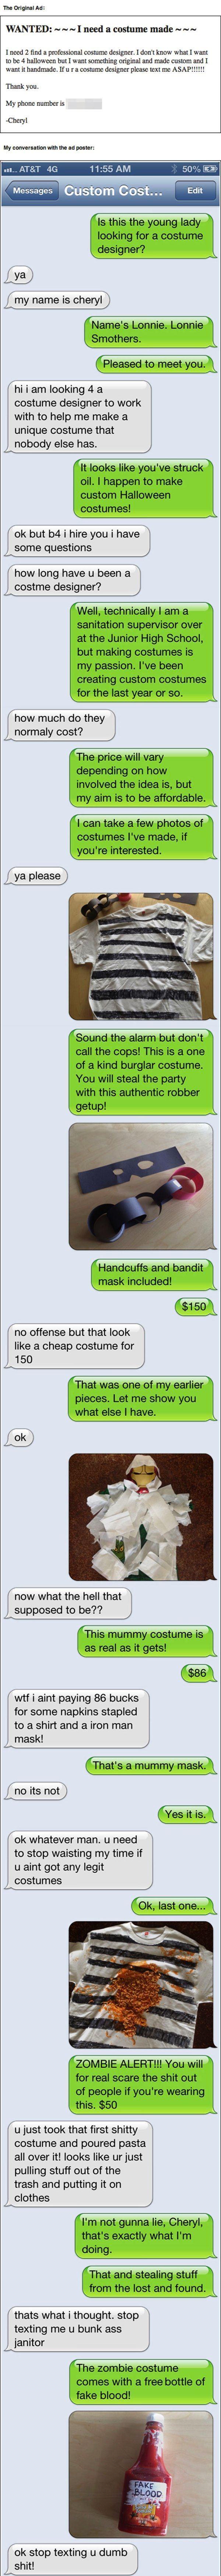 Craigslist Text Prank